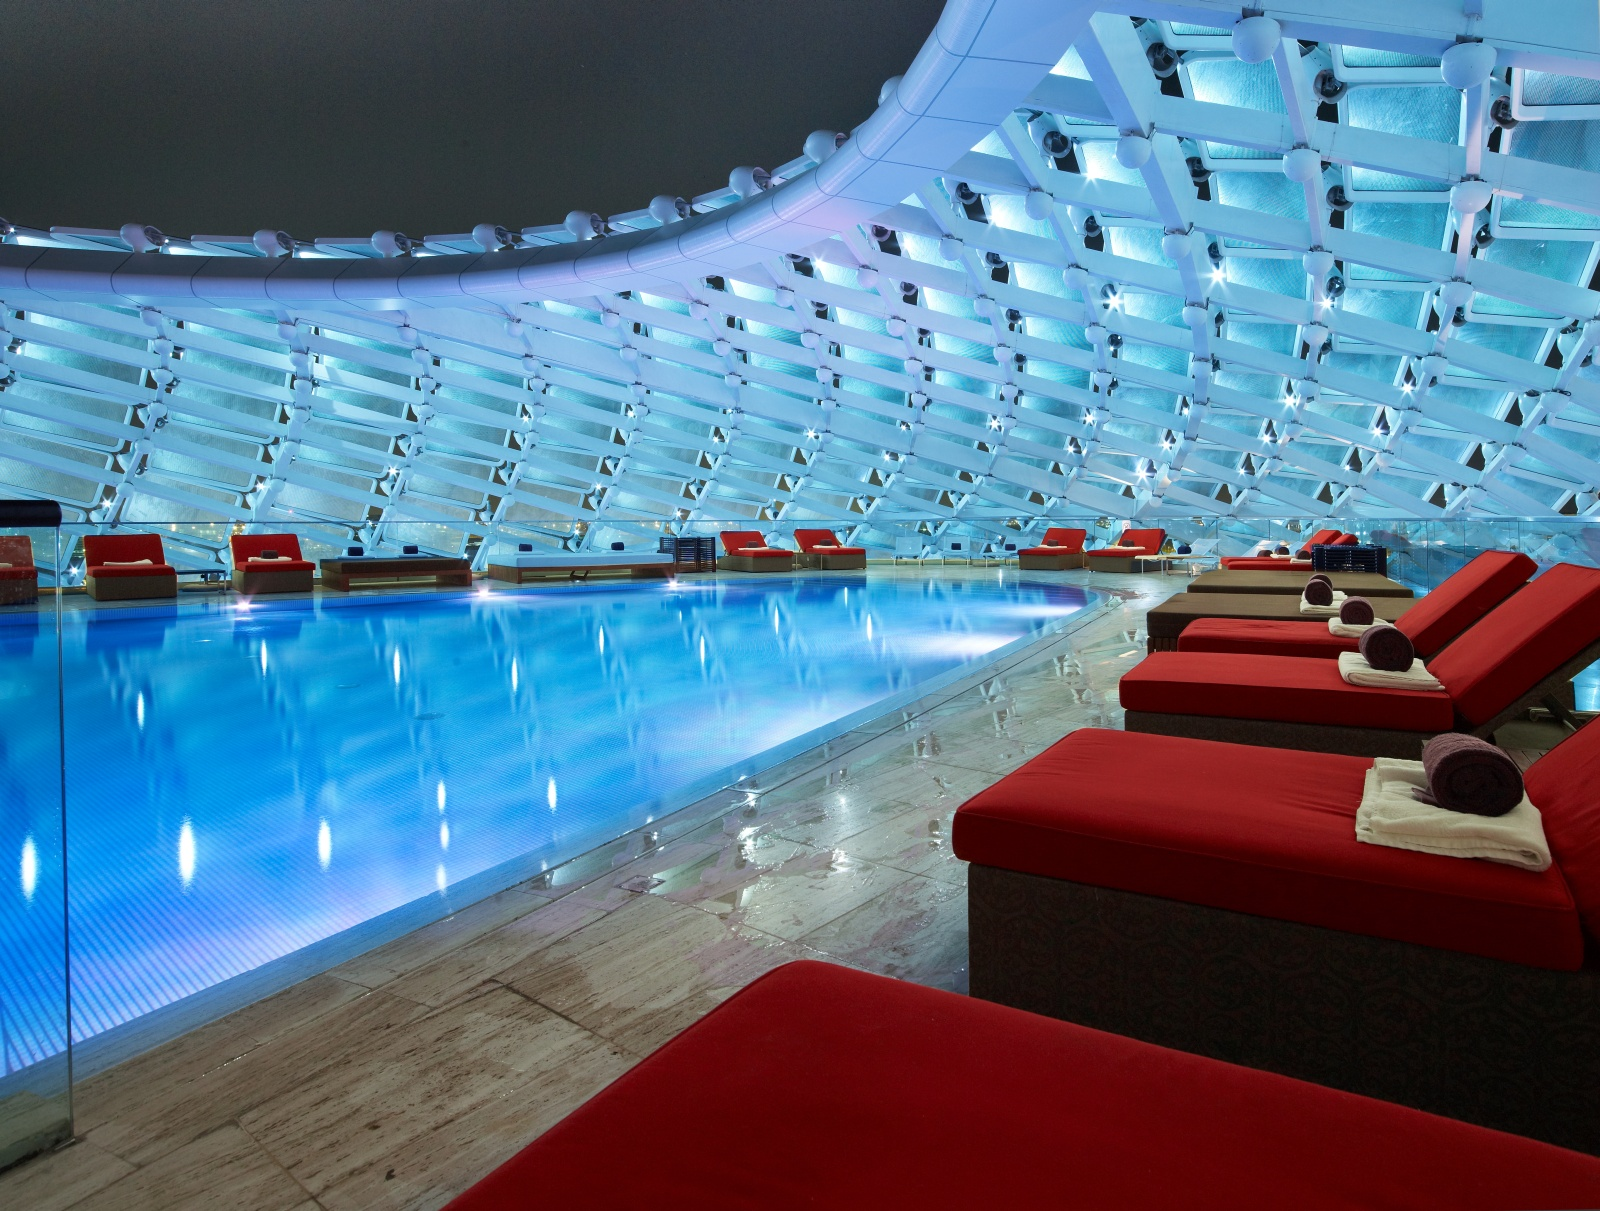 Hotel Yas Marina A Abu Dabhi : Yas viceroy hotel super grand prix